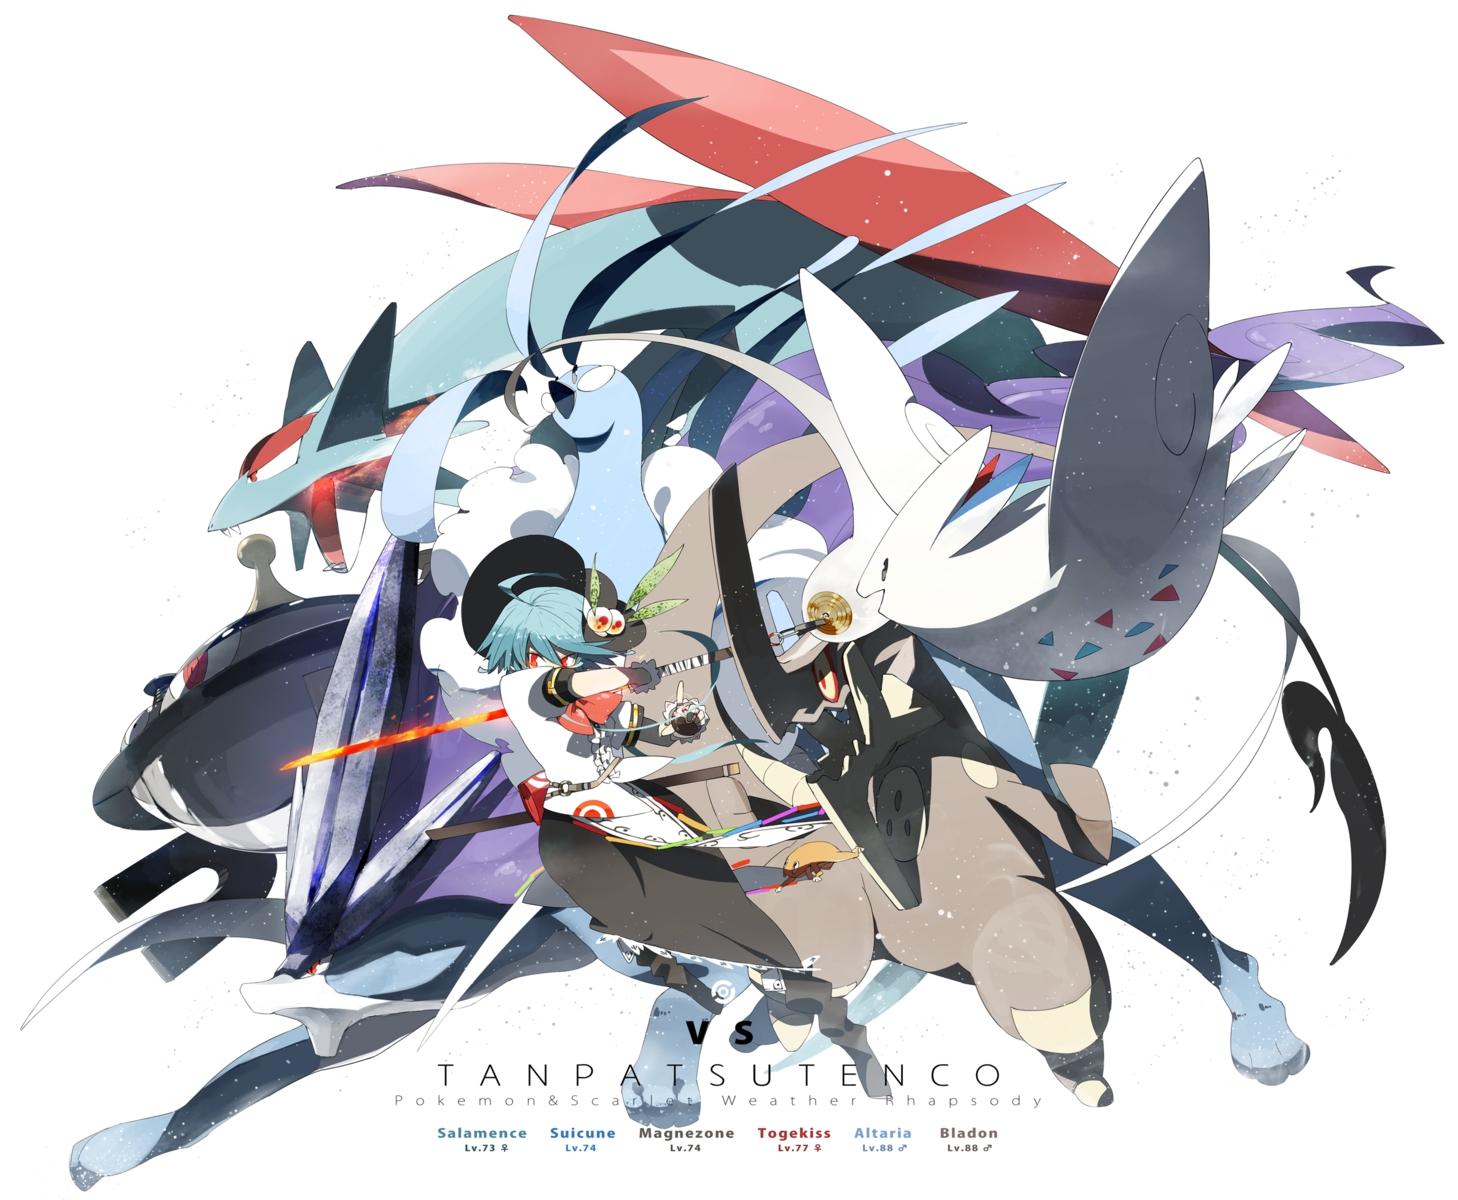 altaria crossover hinanawi_tenshi katana magnezone pokemon salamence siirakannu suicune sword togekiss touhou weapon